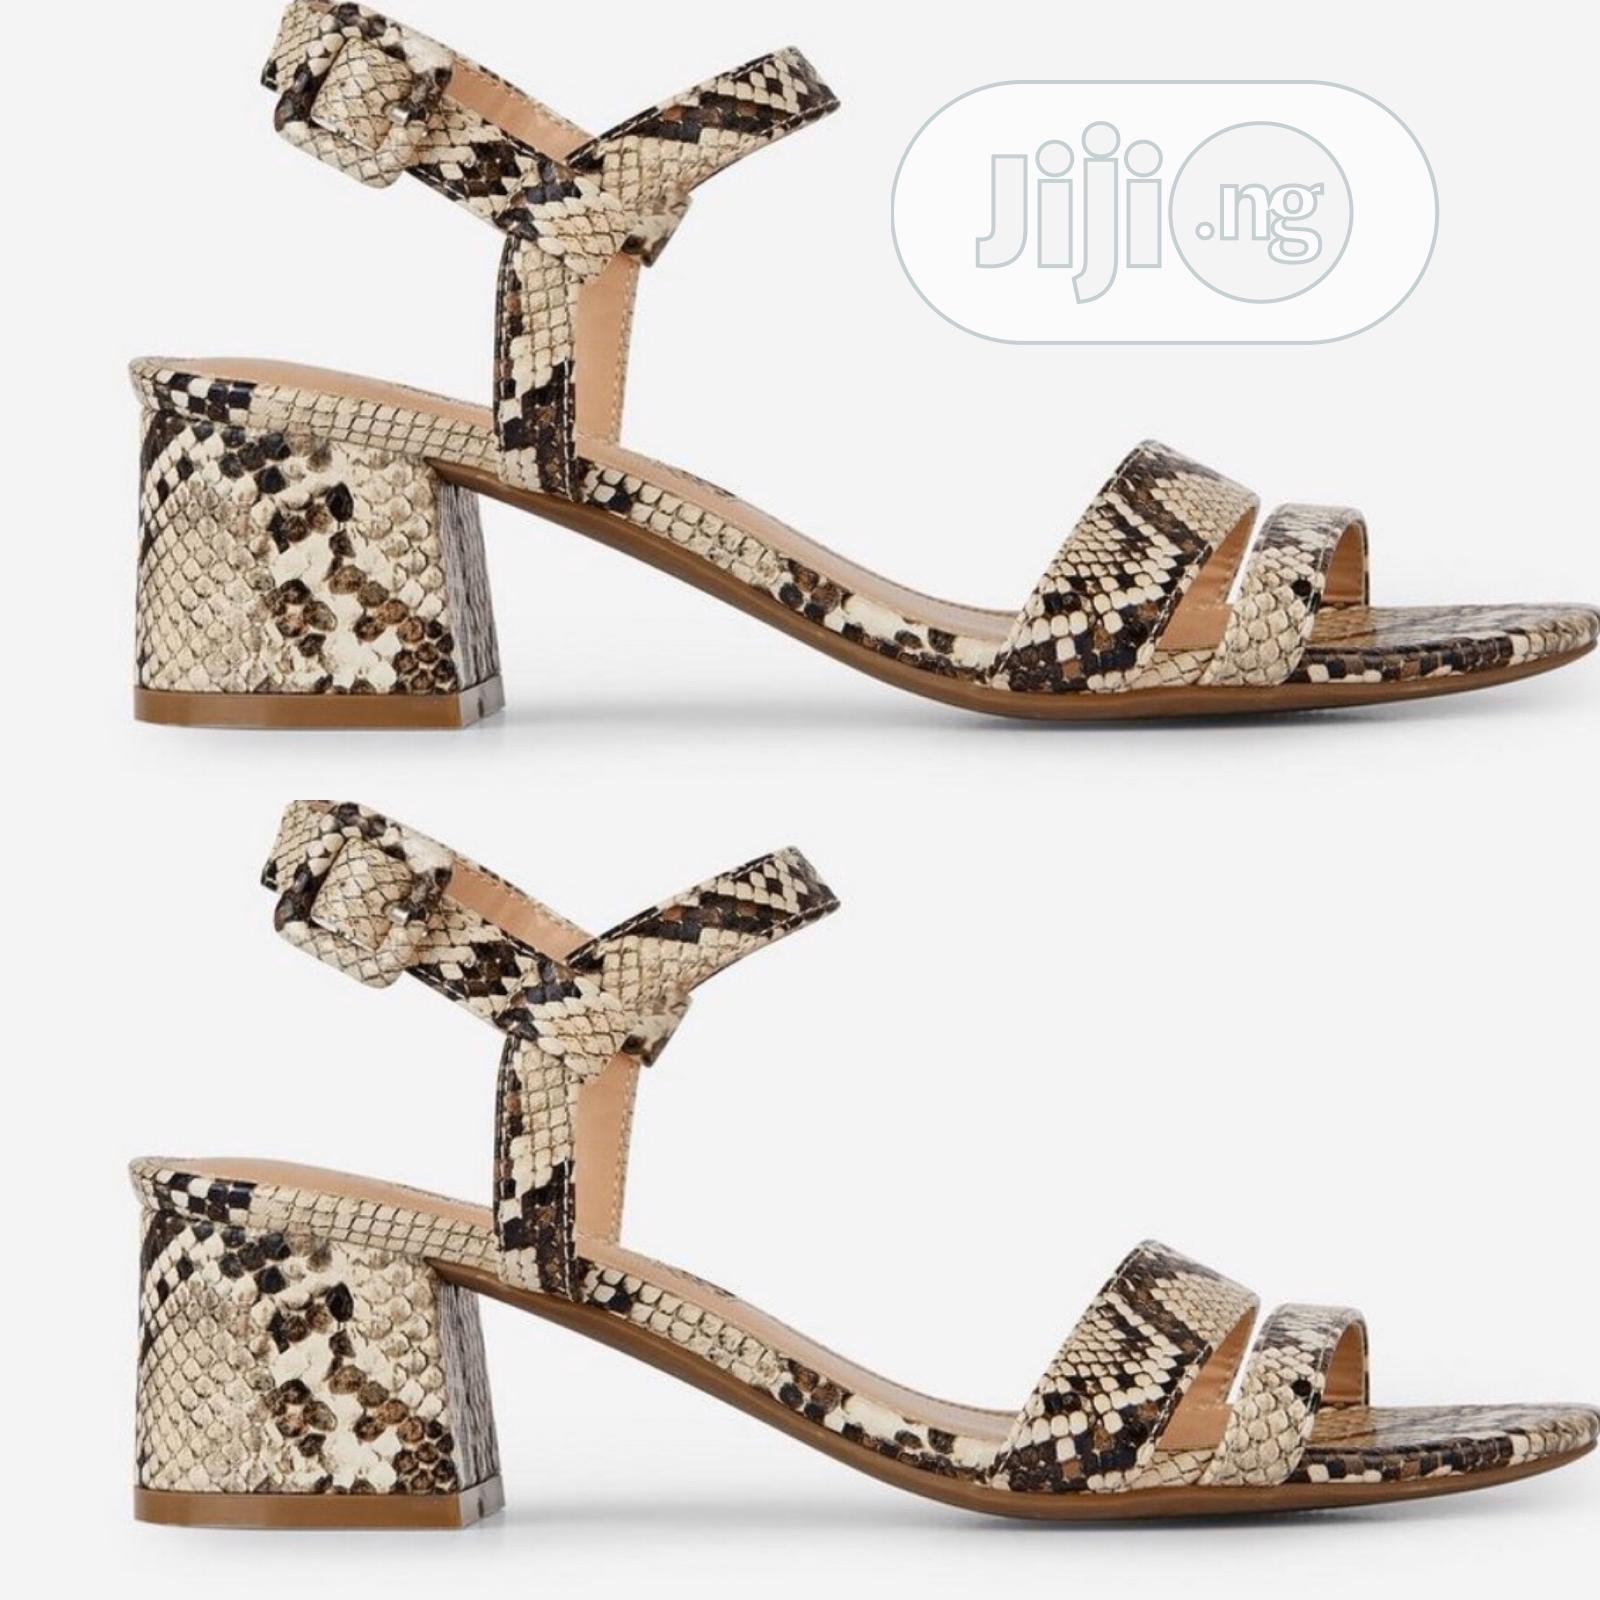 Block Mid Heel Sandals in Wine or Green Animal Skin | Shoes for sale in Lekki, Lagos State, Nigeria